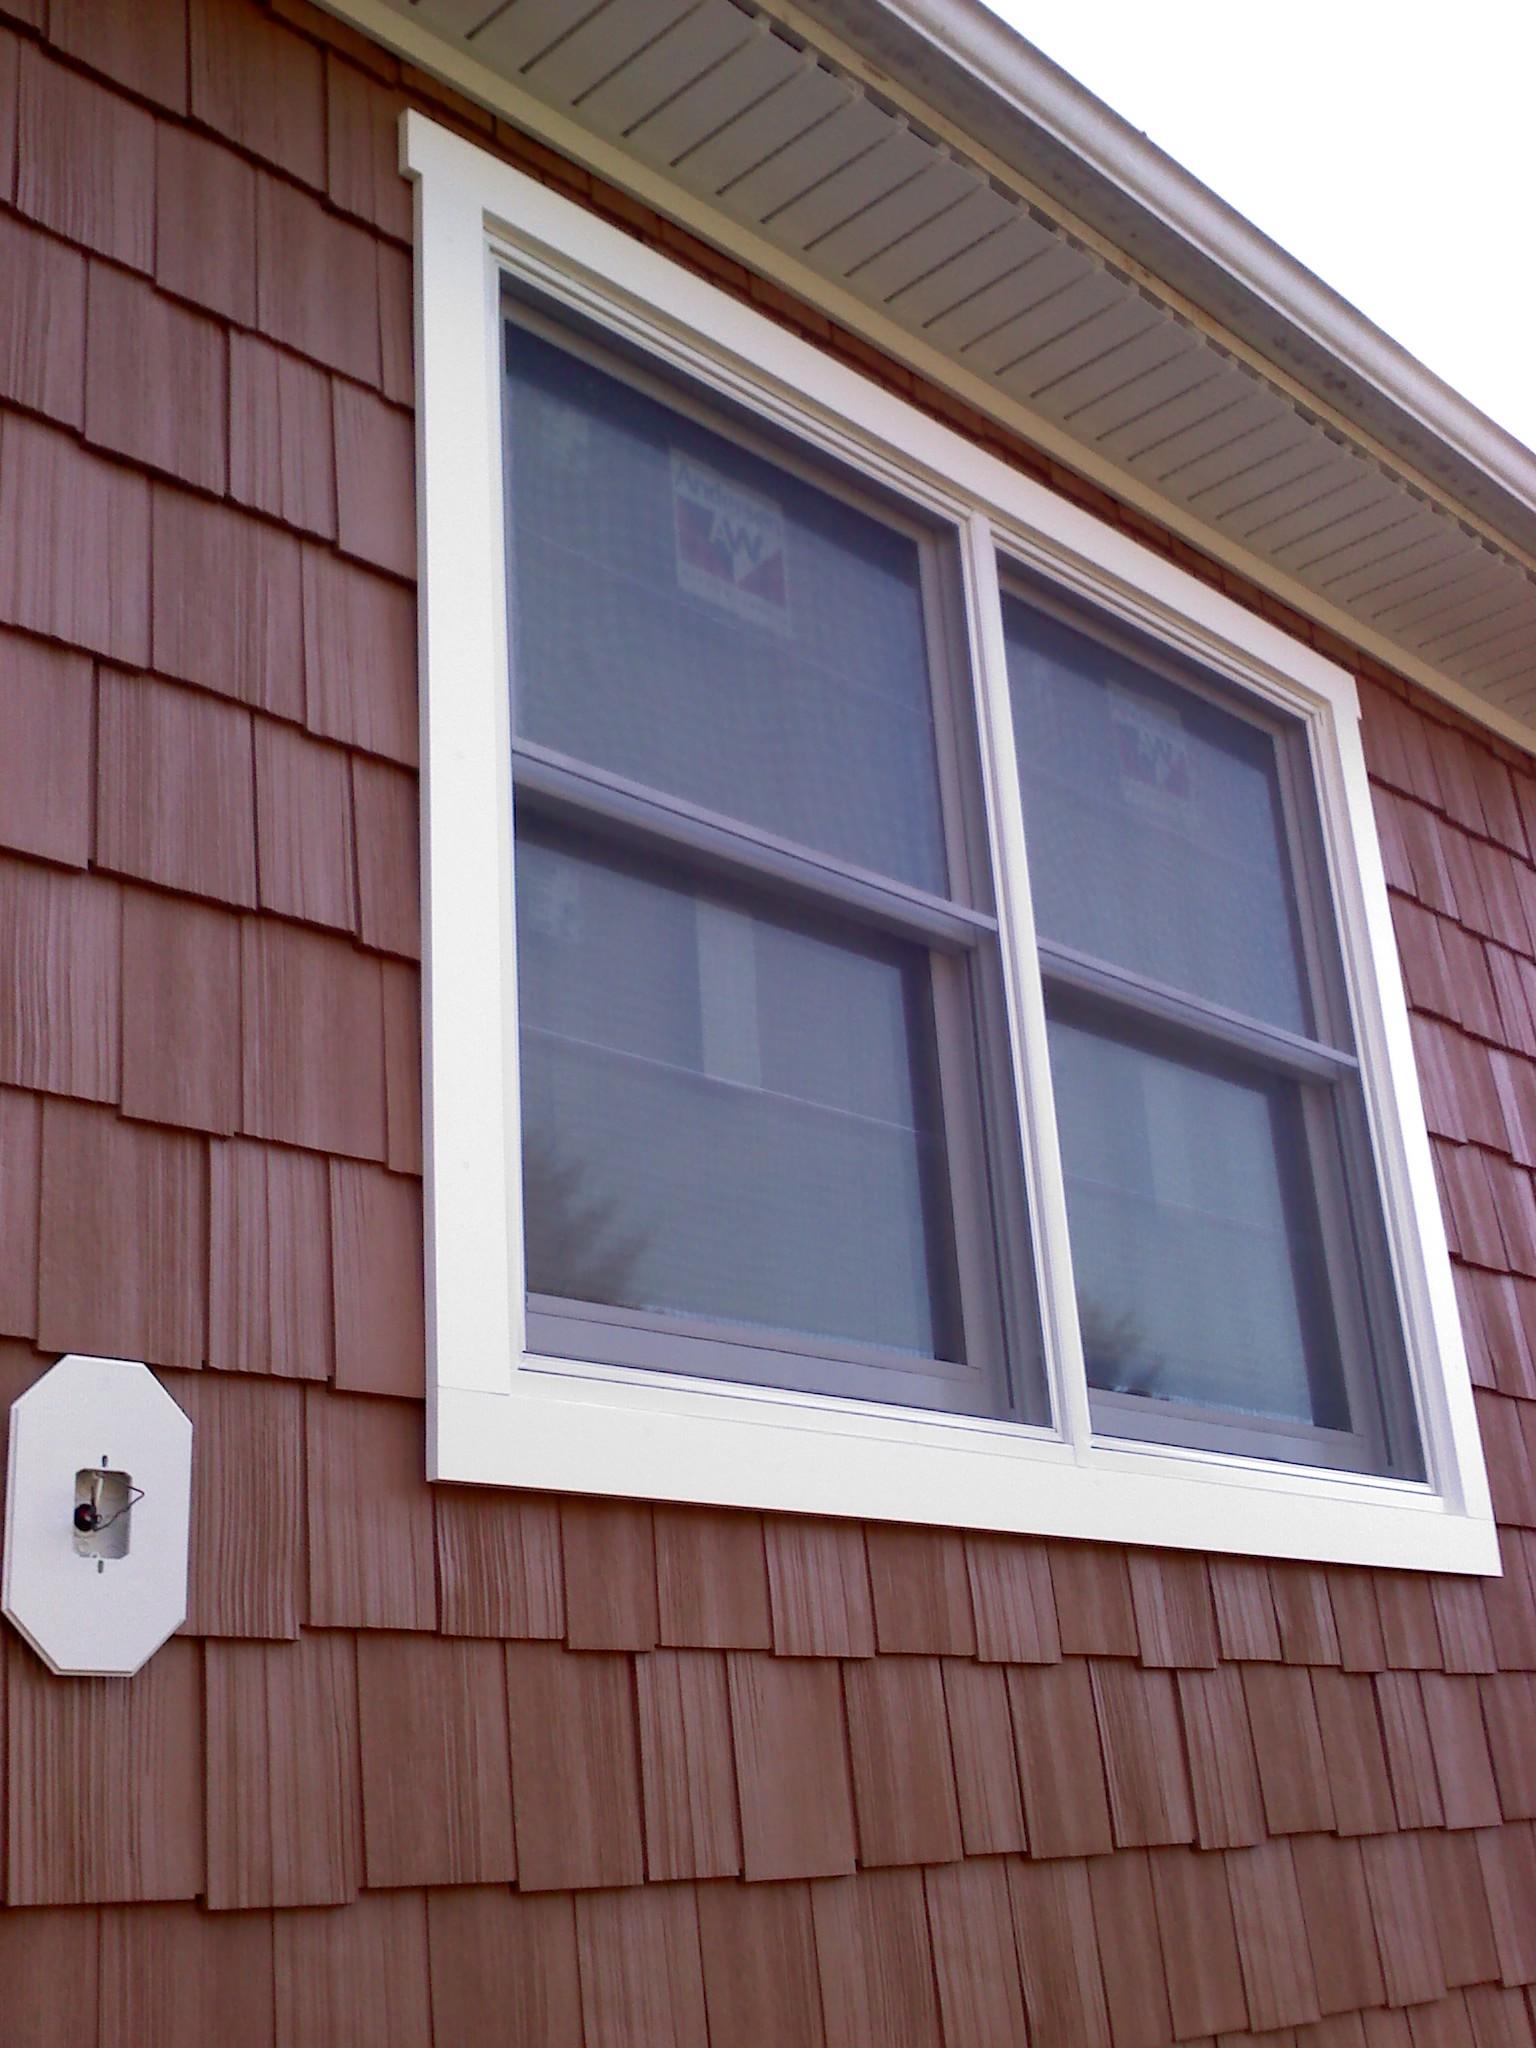 Window Trim With Rain Screen Windows Siding And Doors